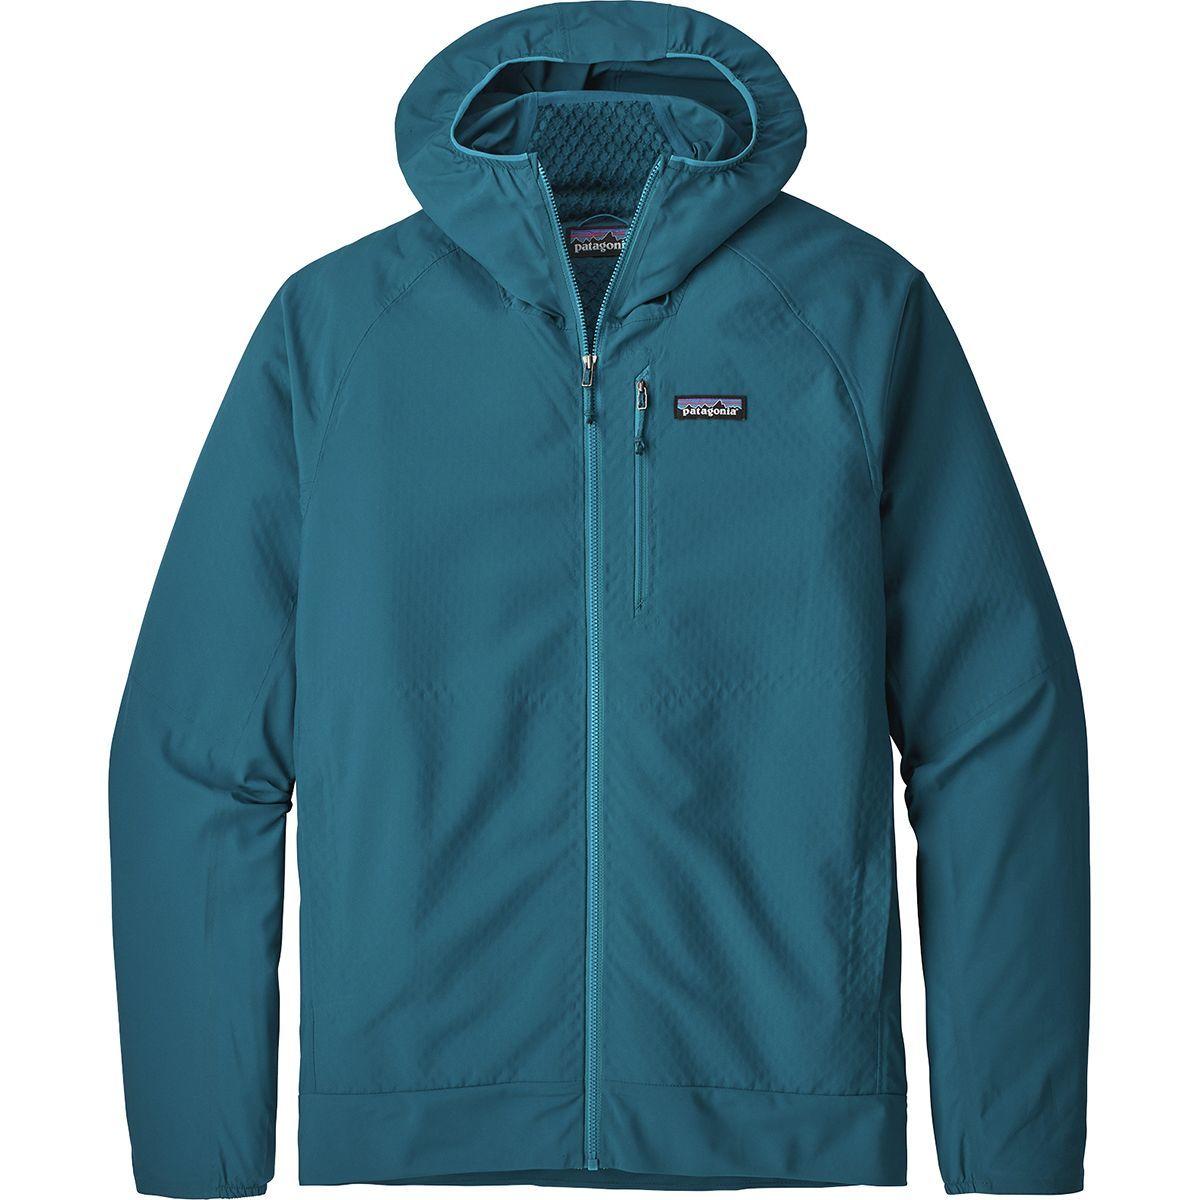 Patagonia Peak Mission Jacket - Men's